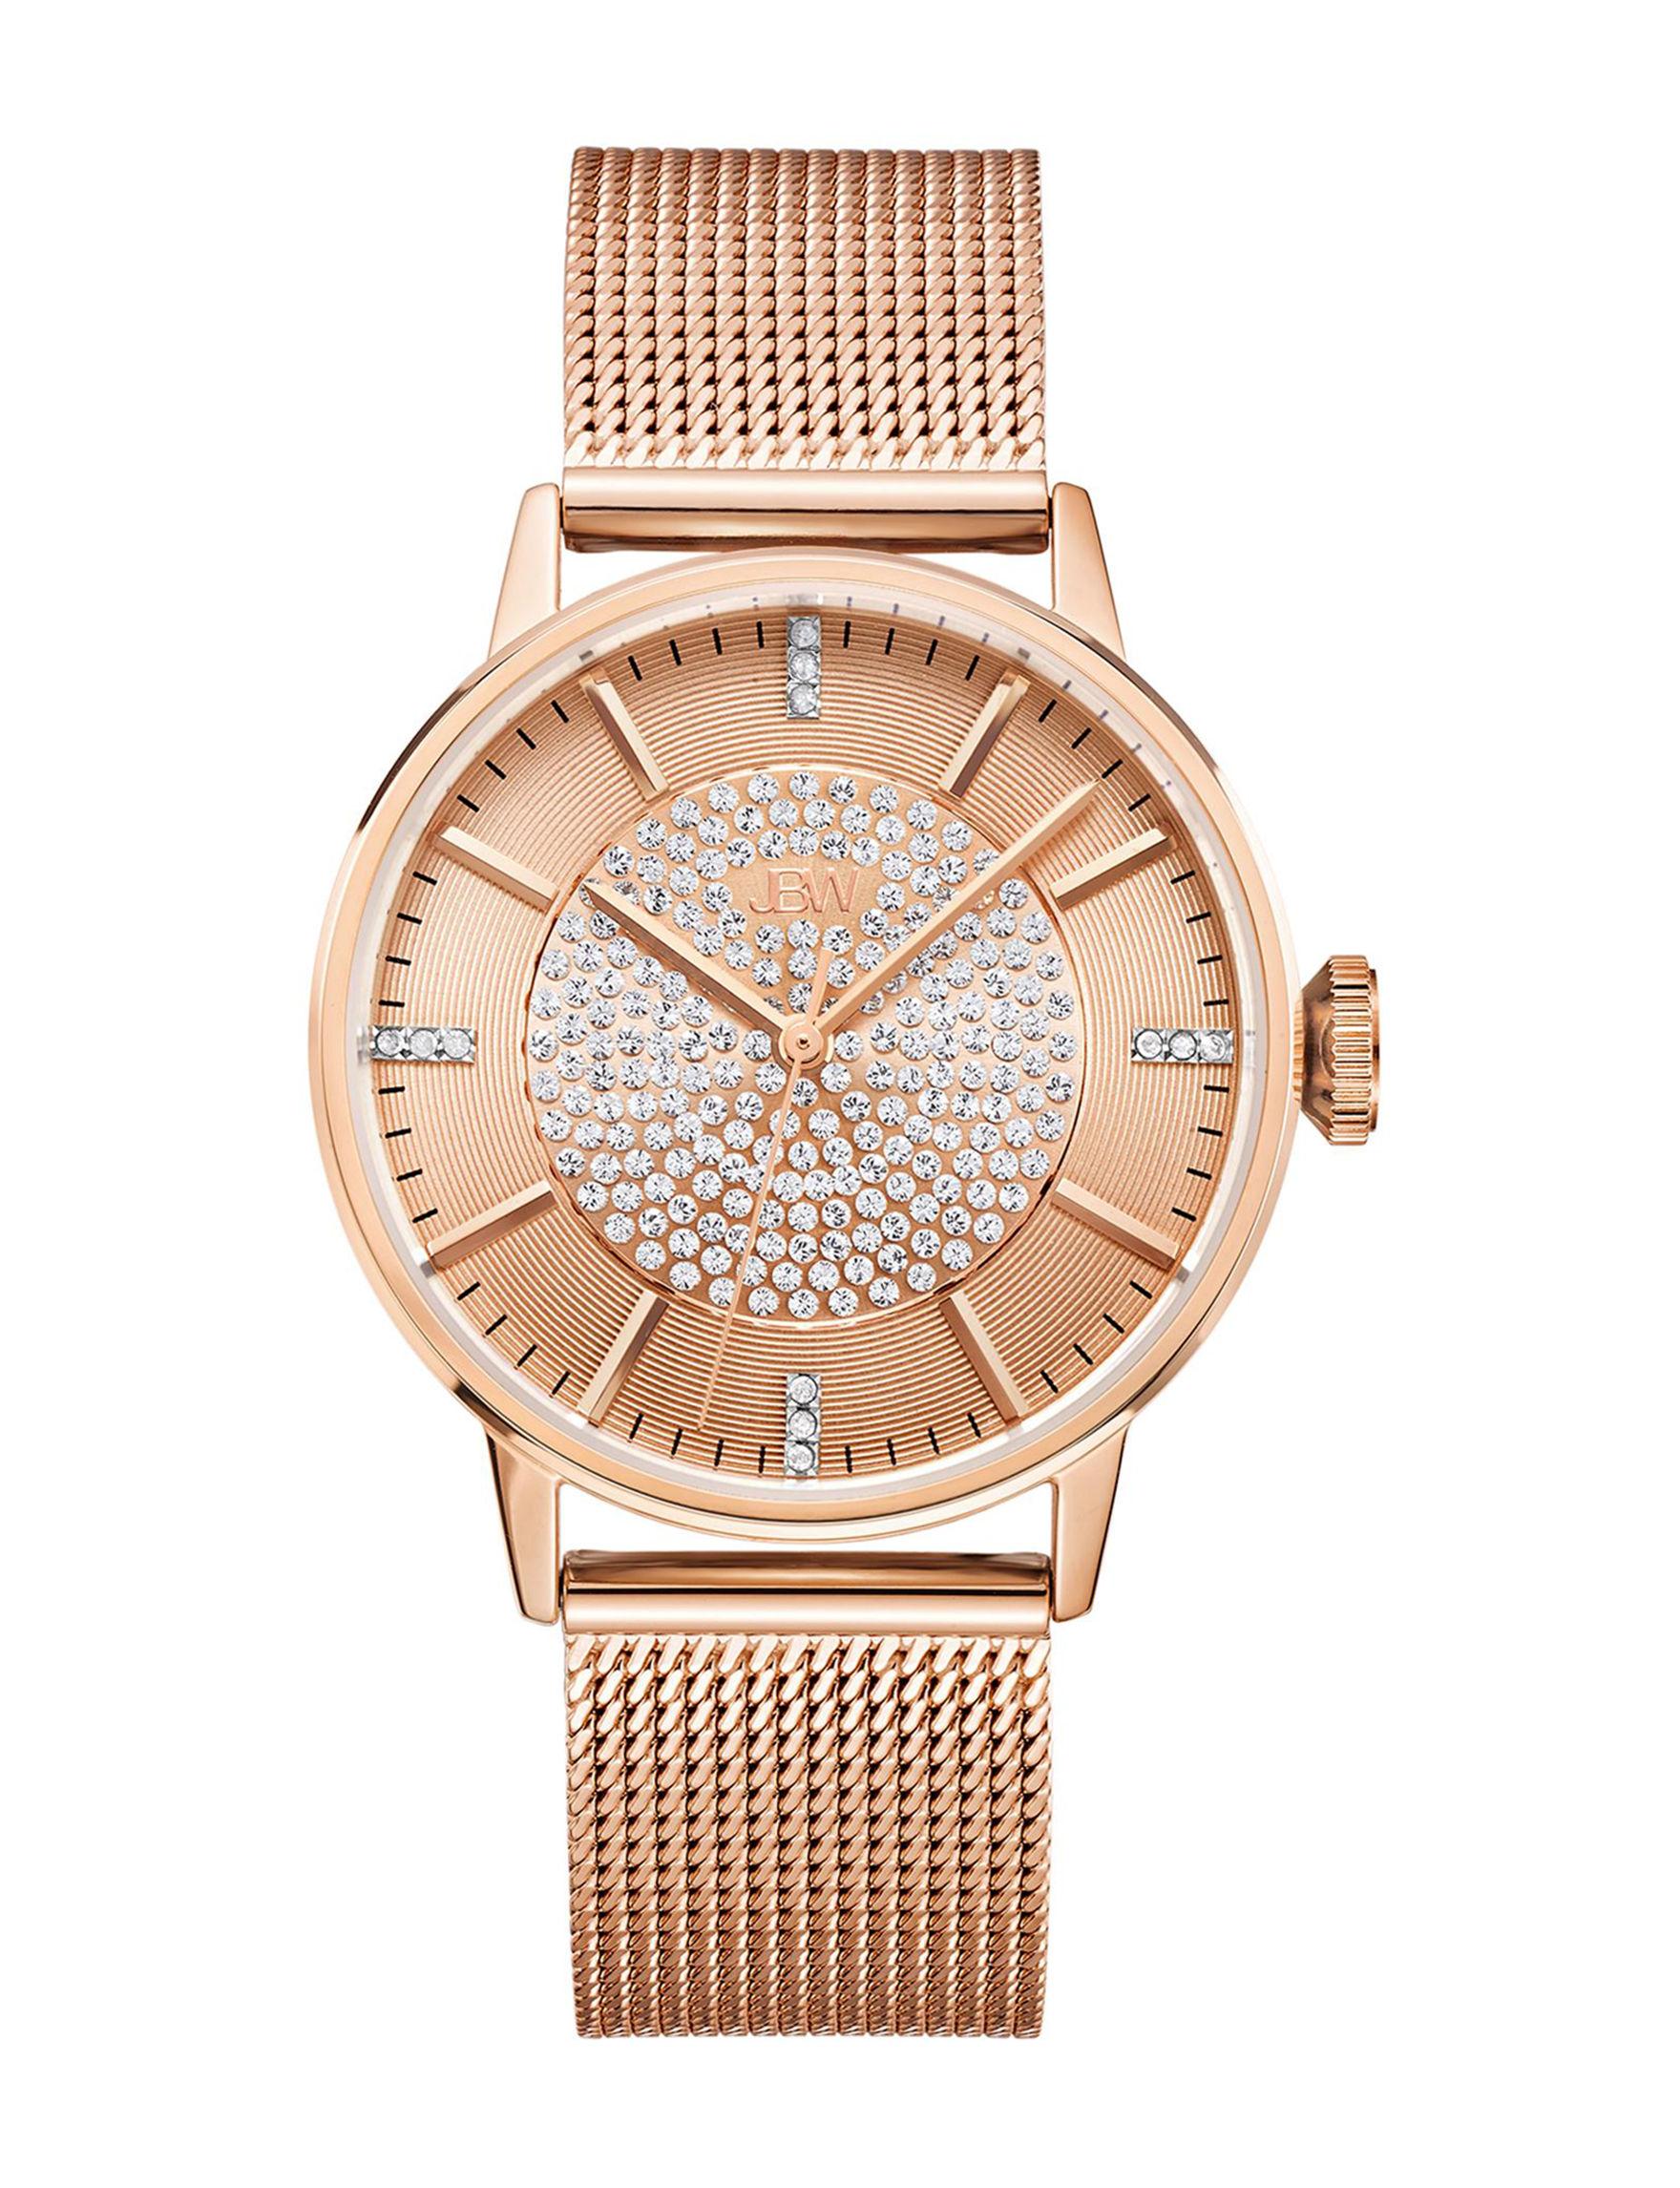 JBW Rose Gold Fashion Watches